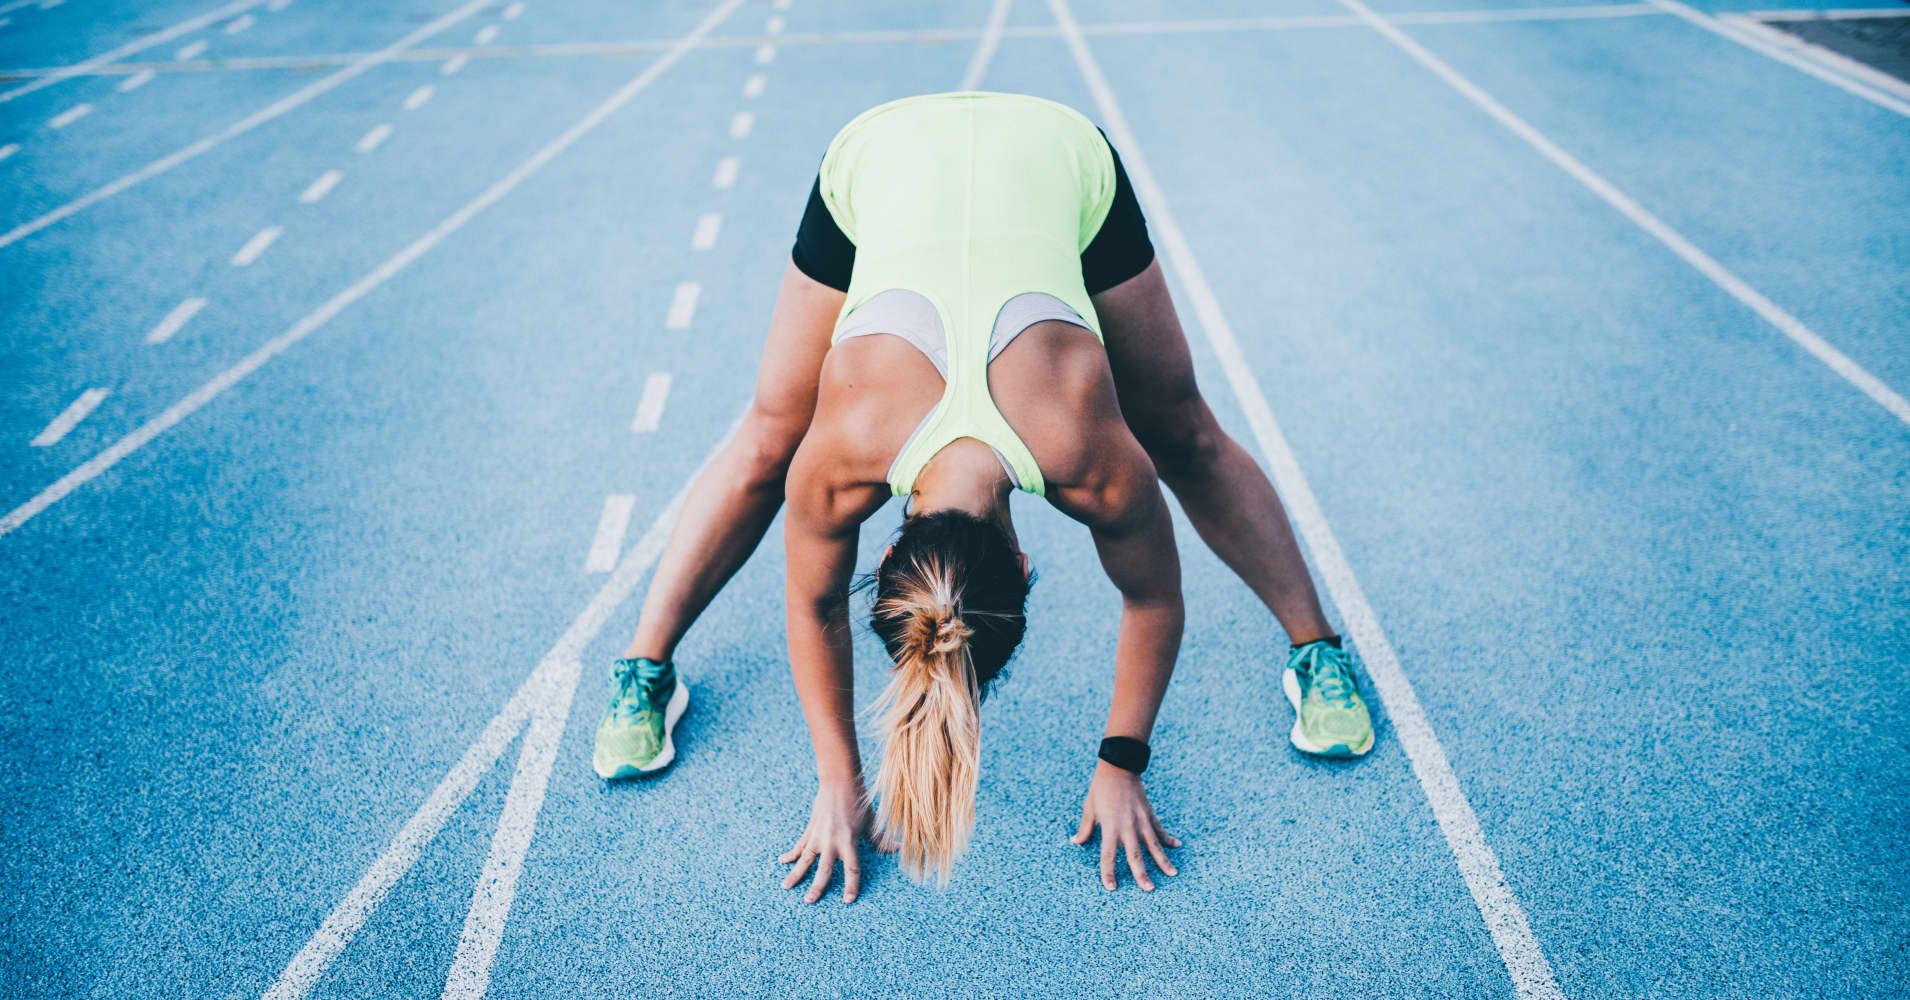 Athlete on running track